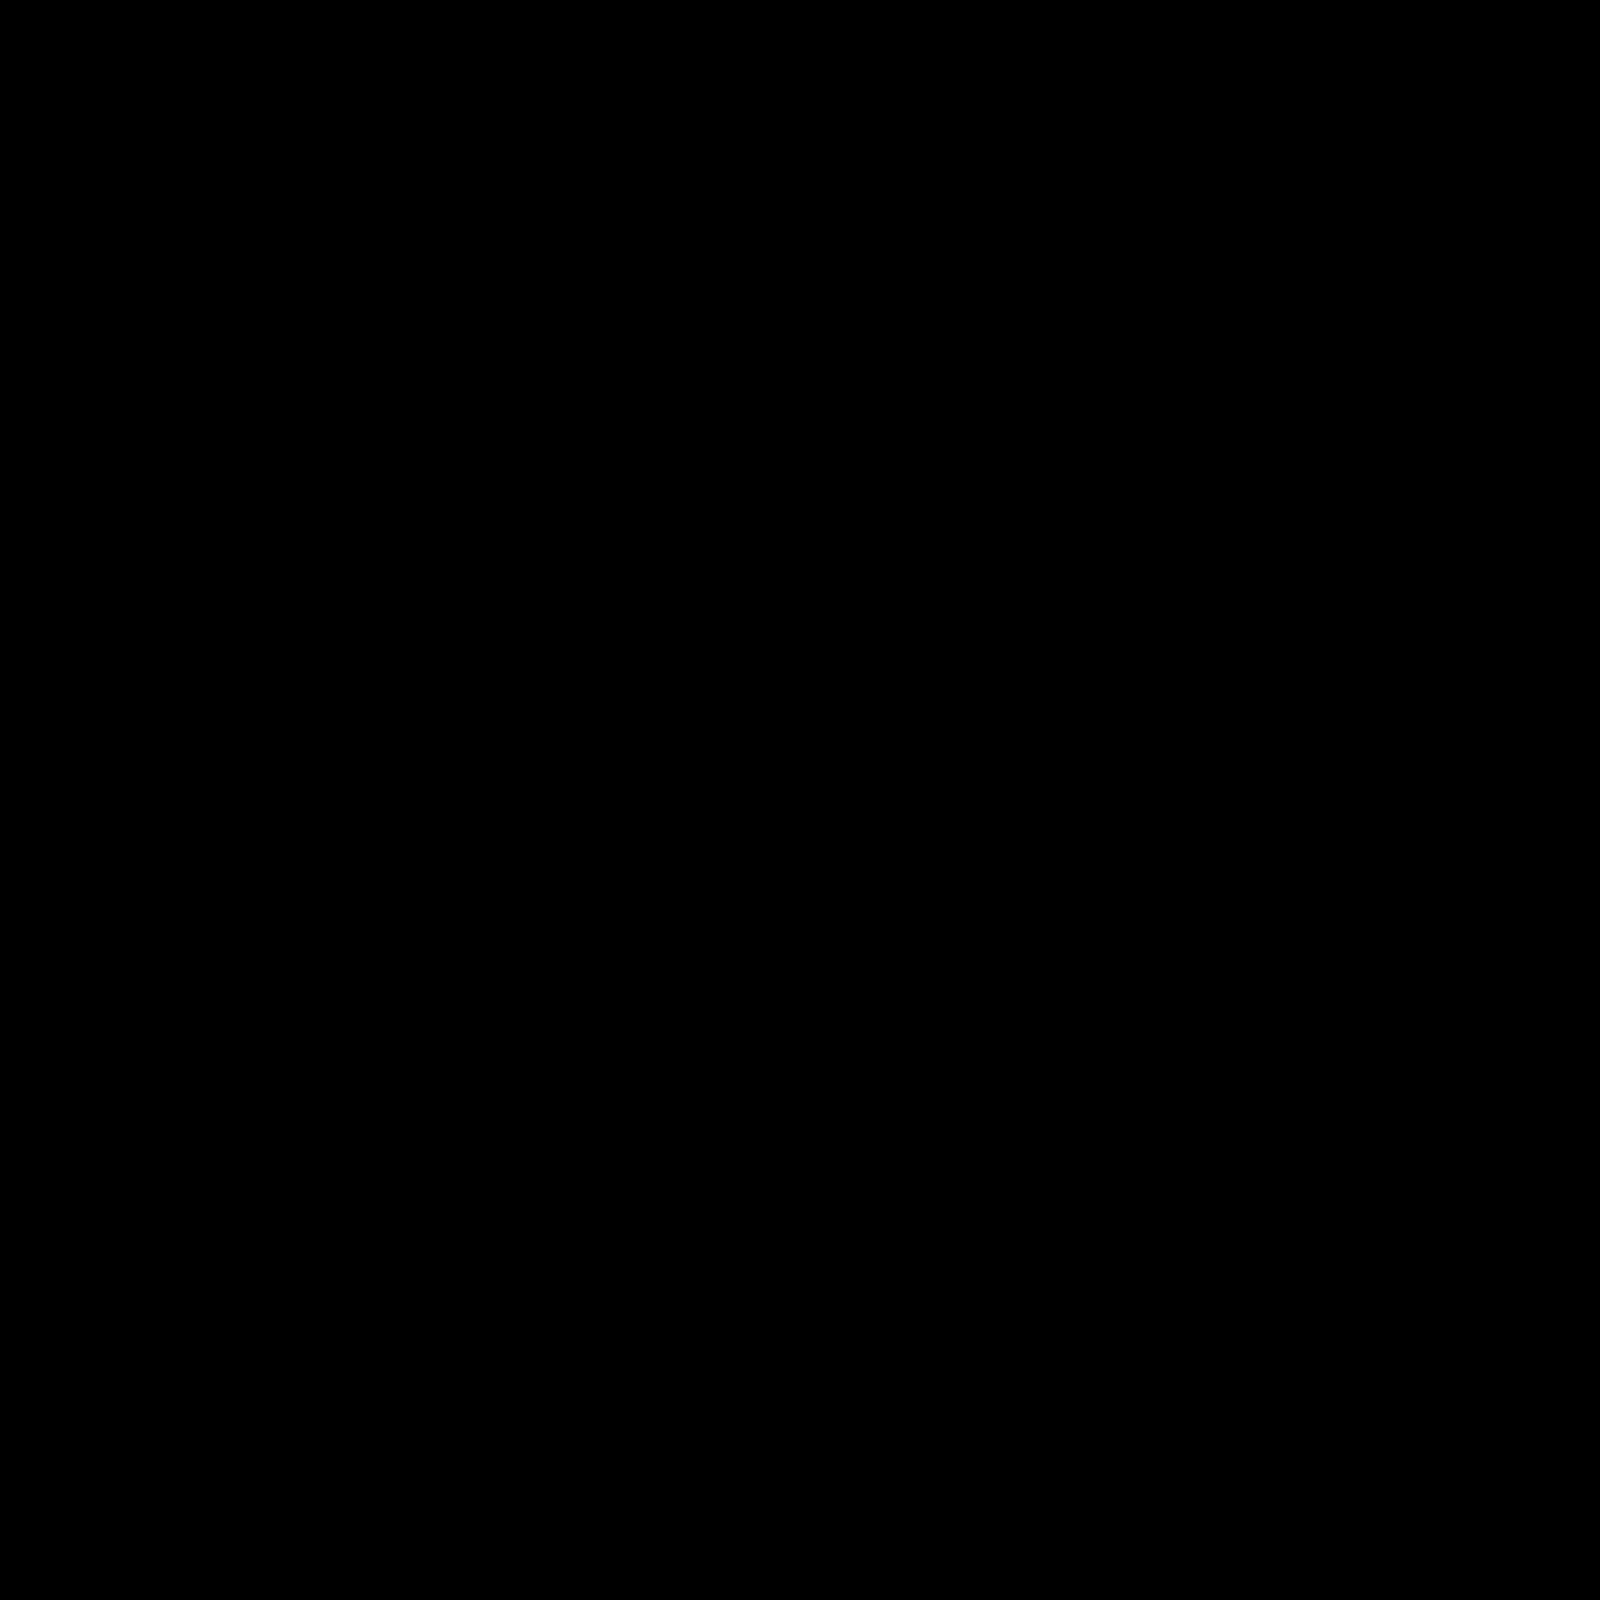 Switzerland Map Filled icon